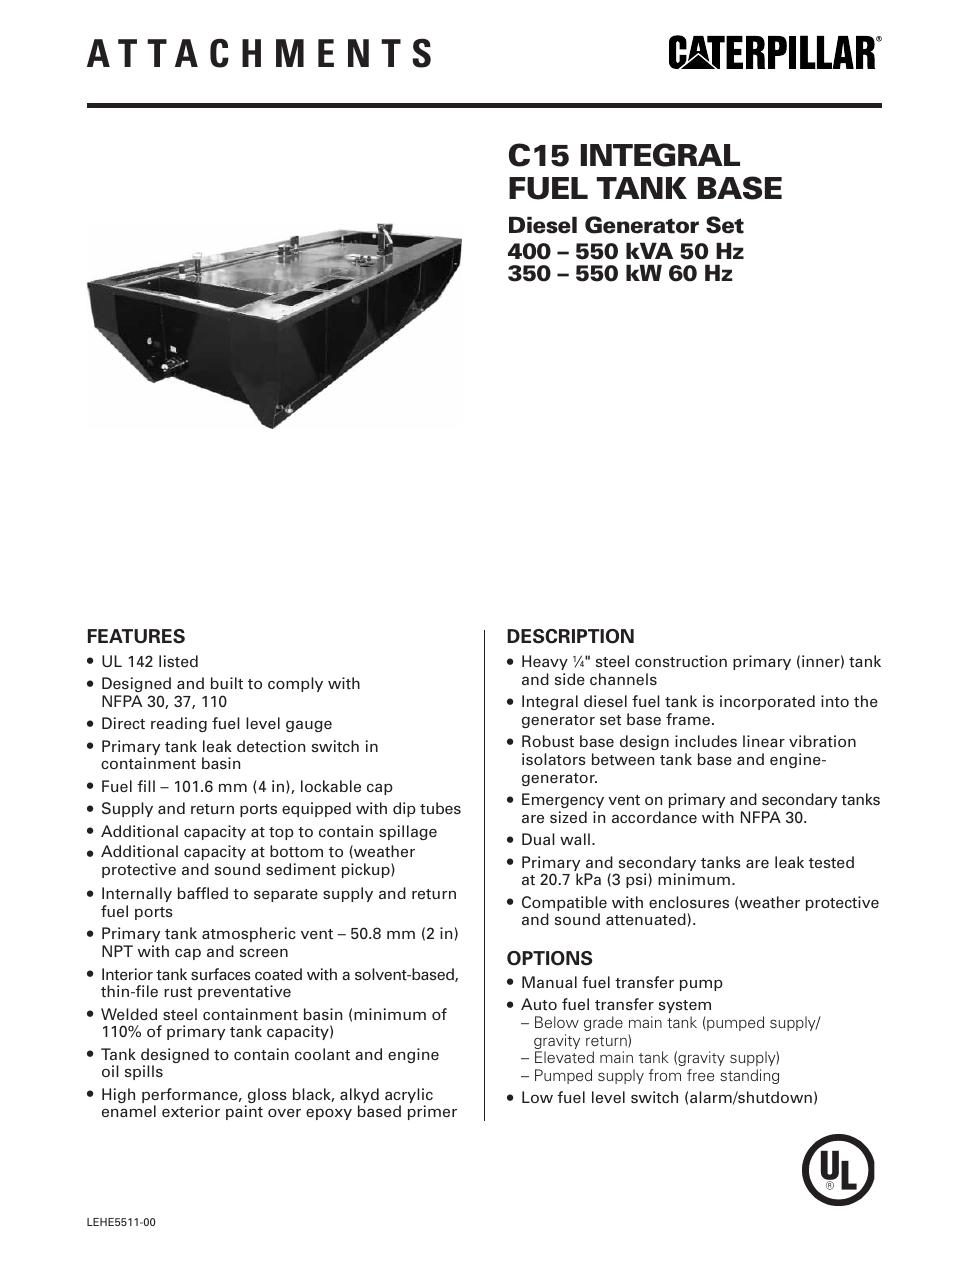 Milton Cat C15 Factory Integral Fuel Tank Base User Manual